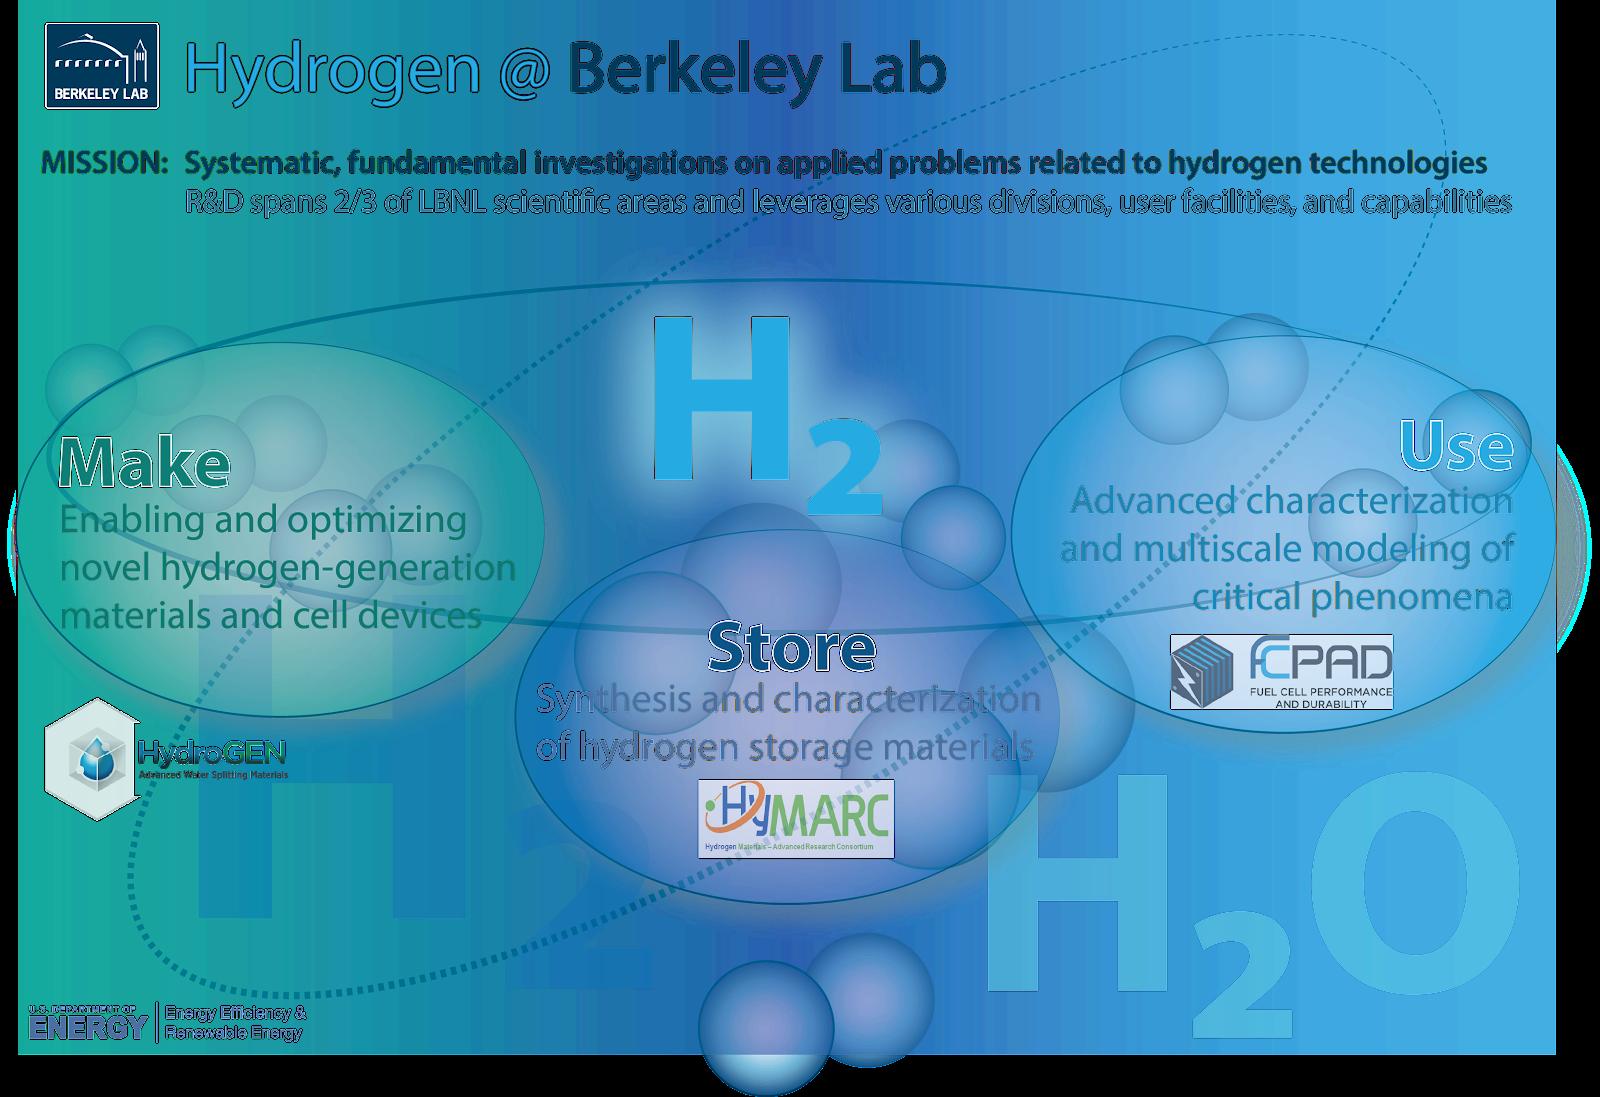 Hydrogen@Berkeley Lab infographic CREDIT: Ahmet Kusoglu, Berkeley Lab